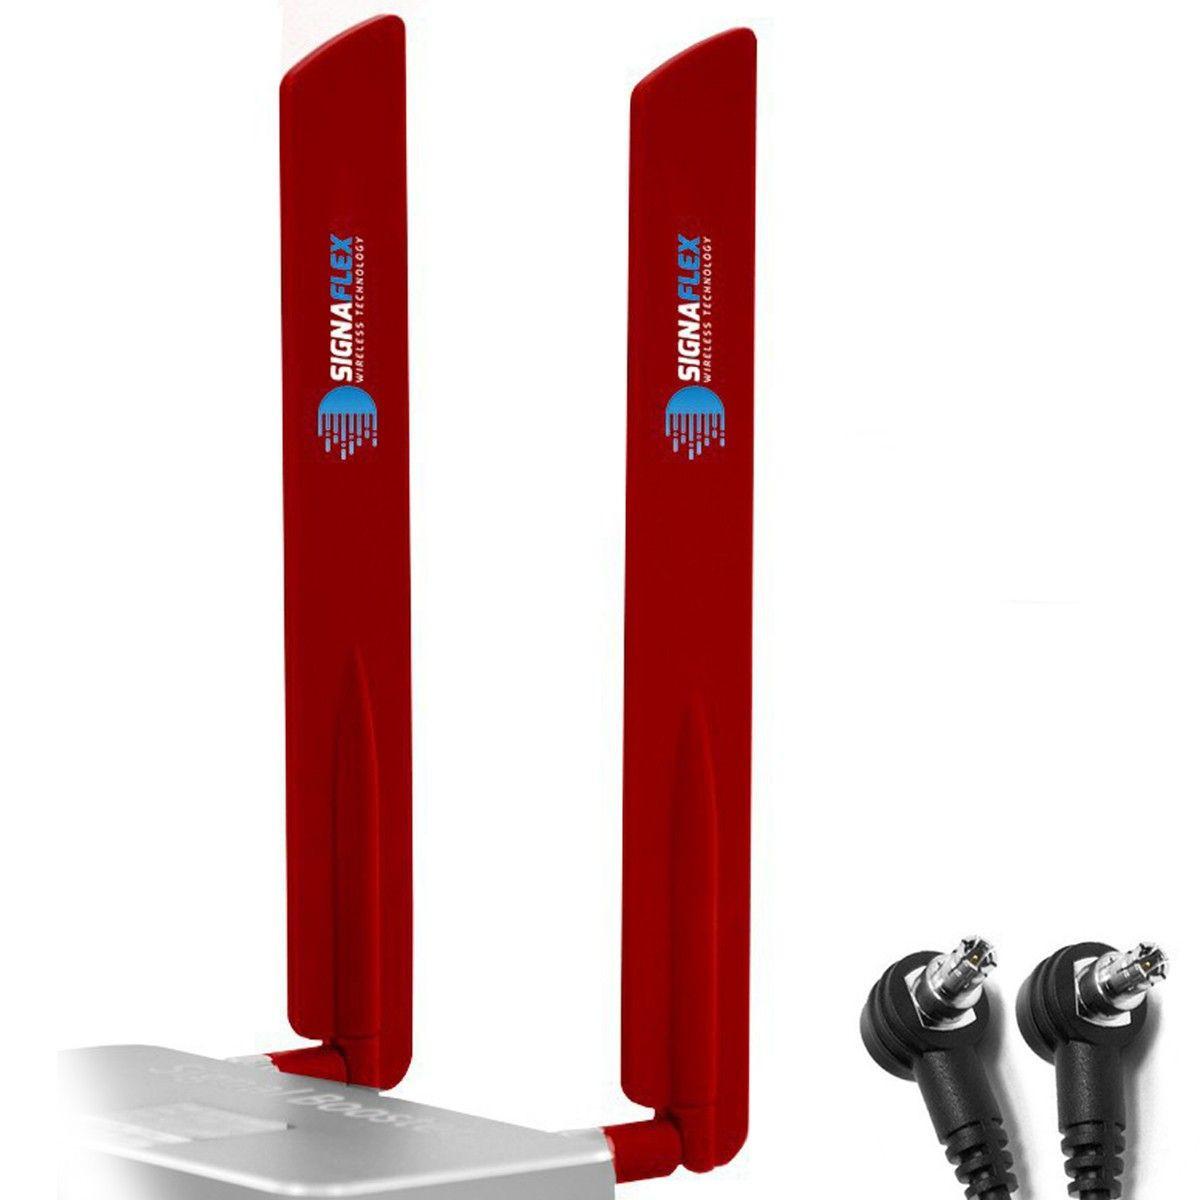 2 x  Antena bat 4G LTE red 15dbi + TS9